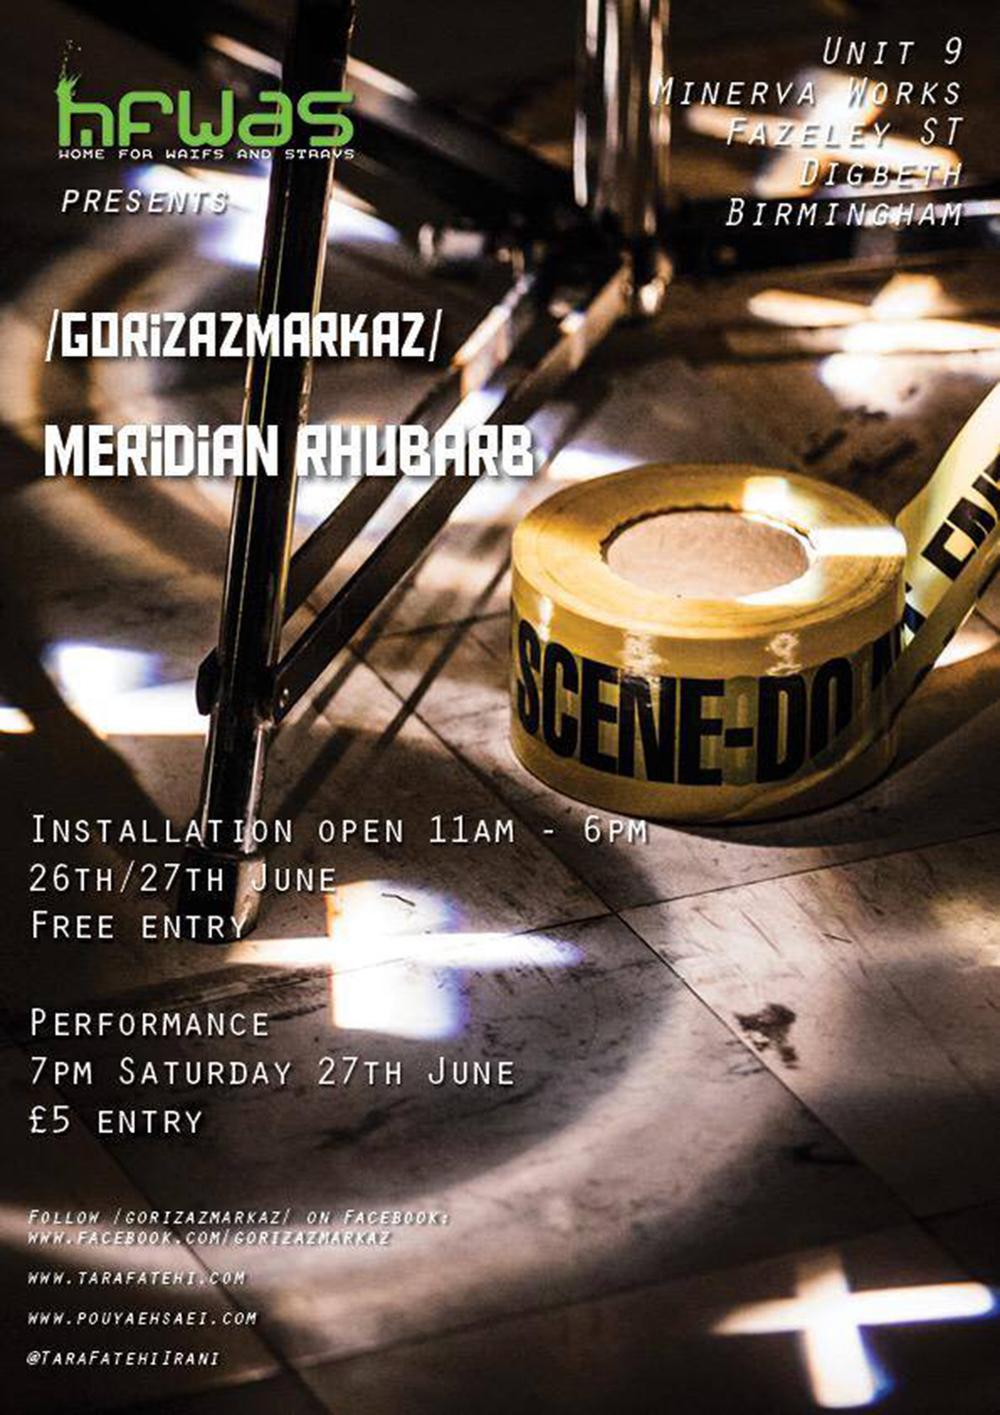 /gorizazmarkaz/ Meridian Rhubarb    Poster   2015